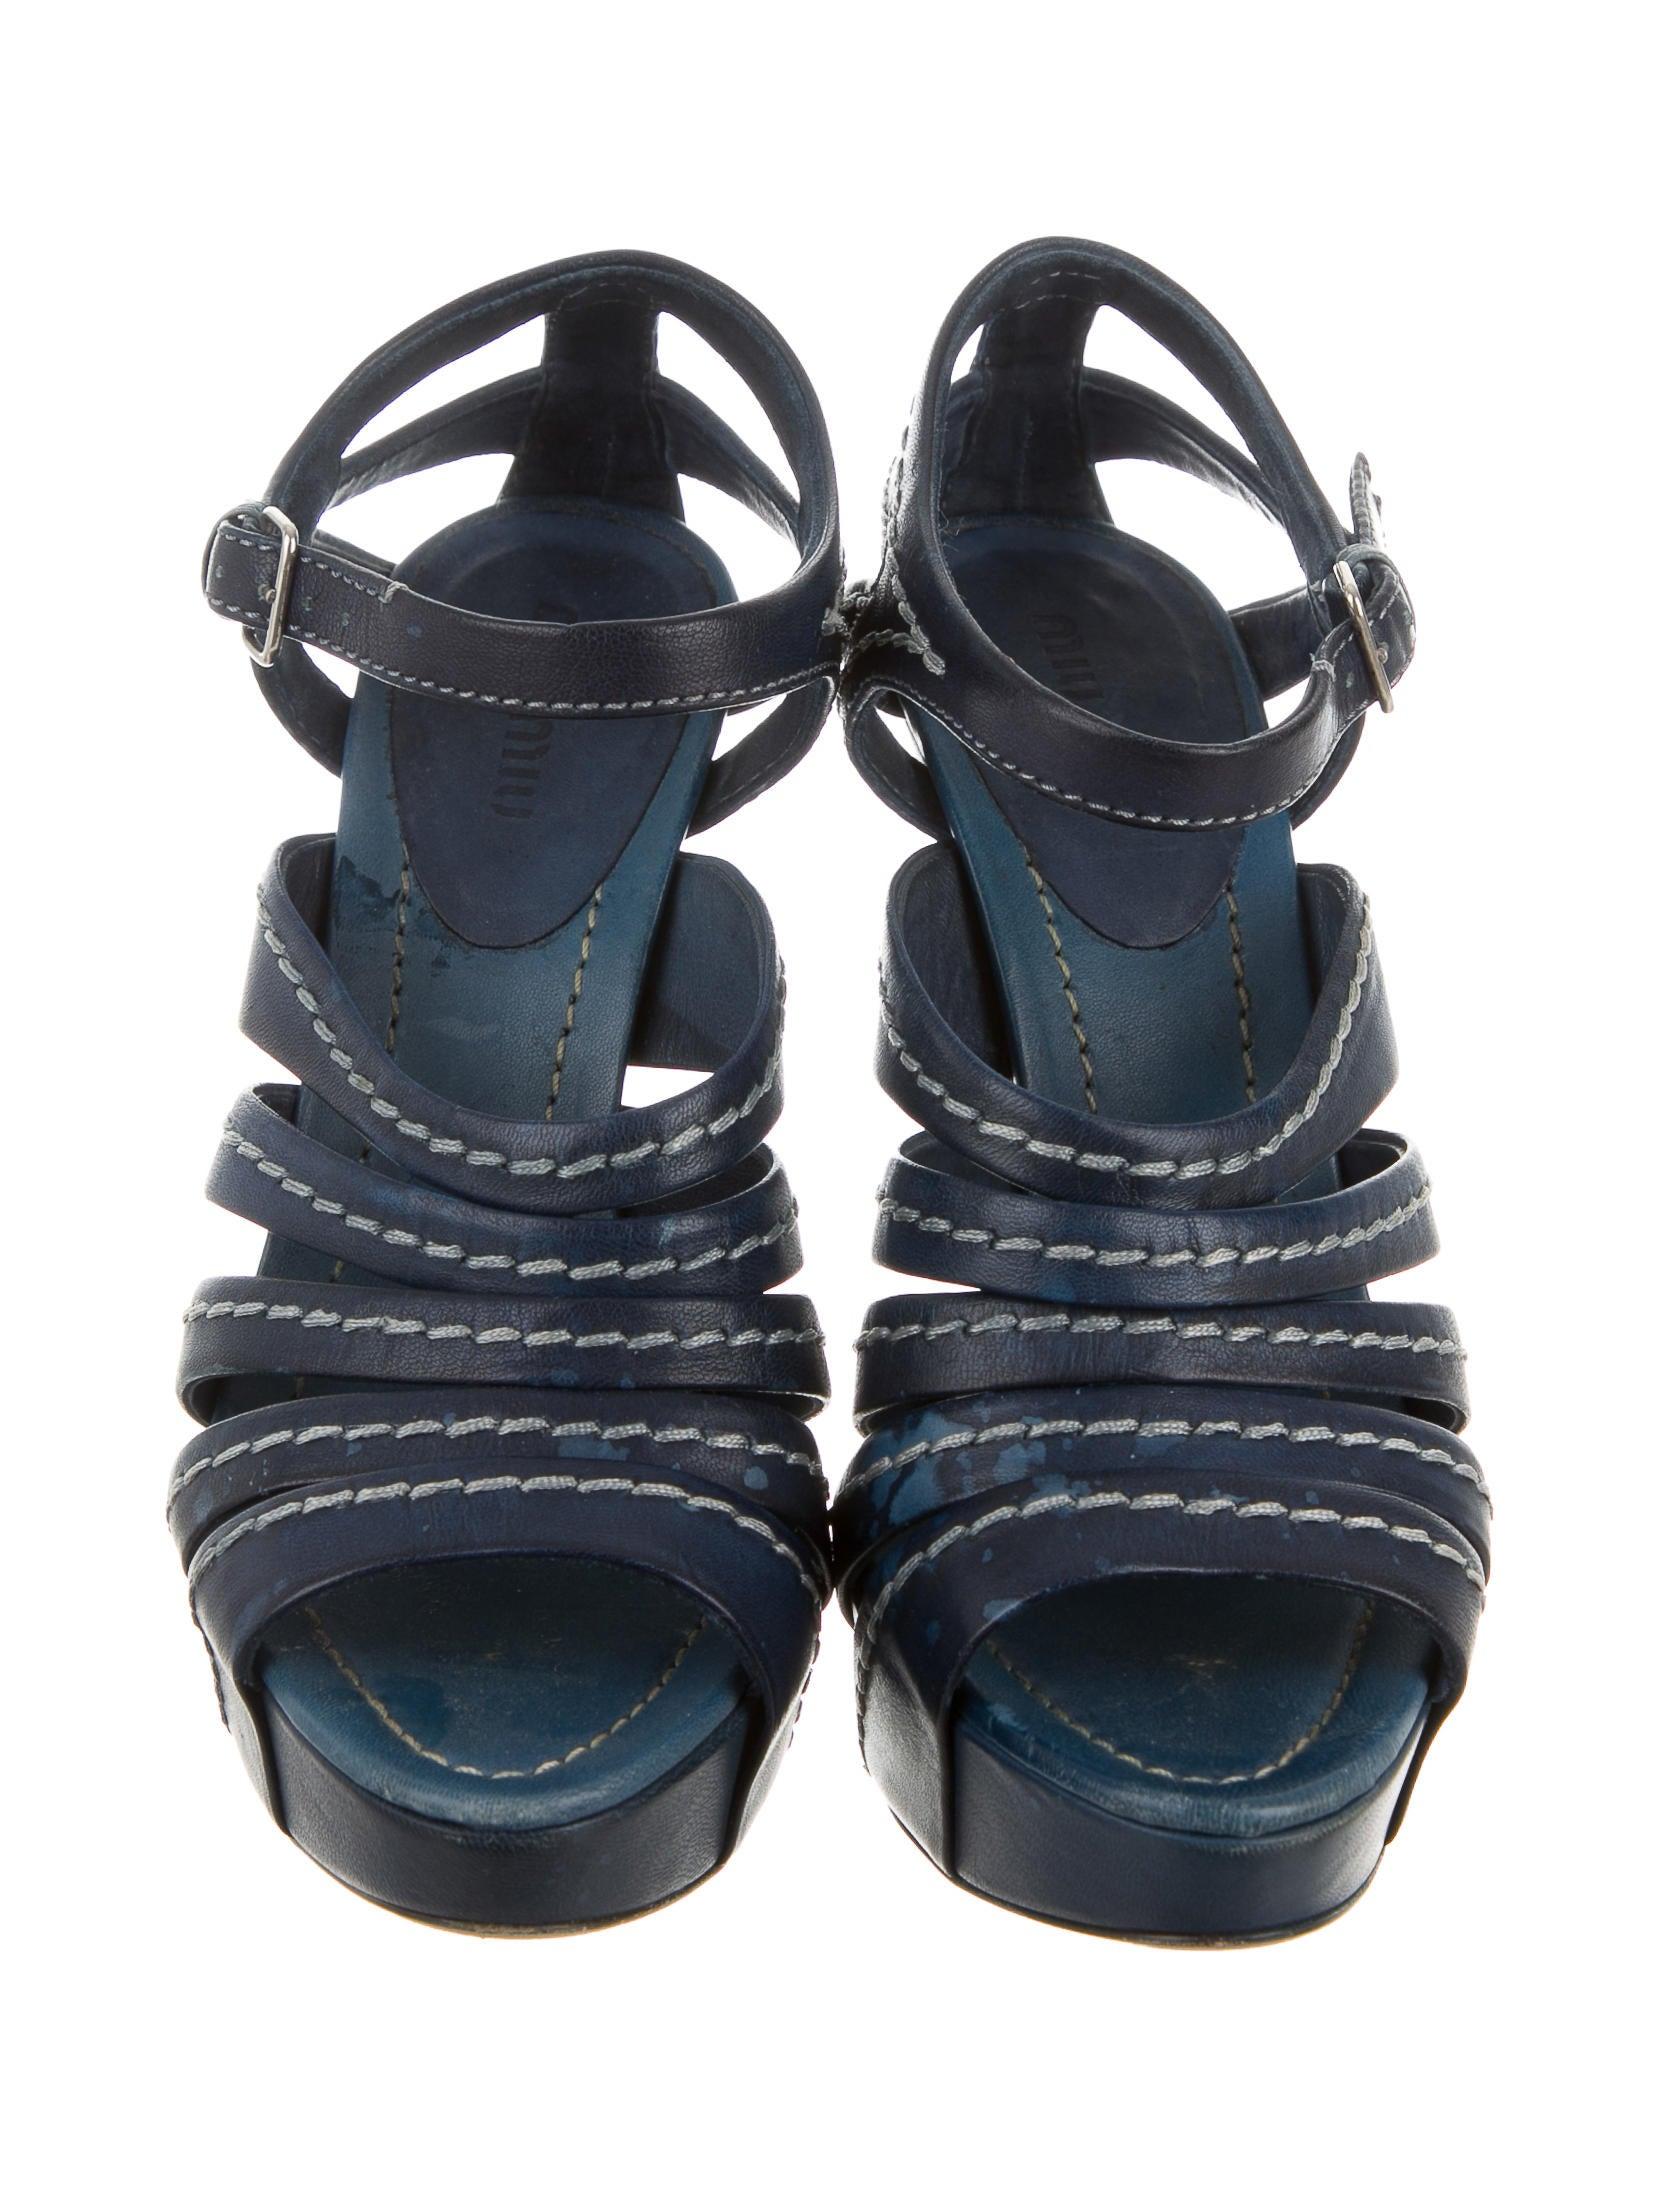 miu miu leather platform sandals shoes miu40144 the